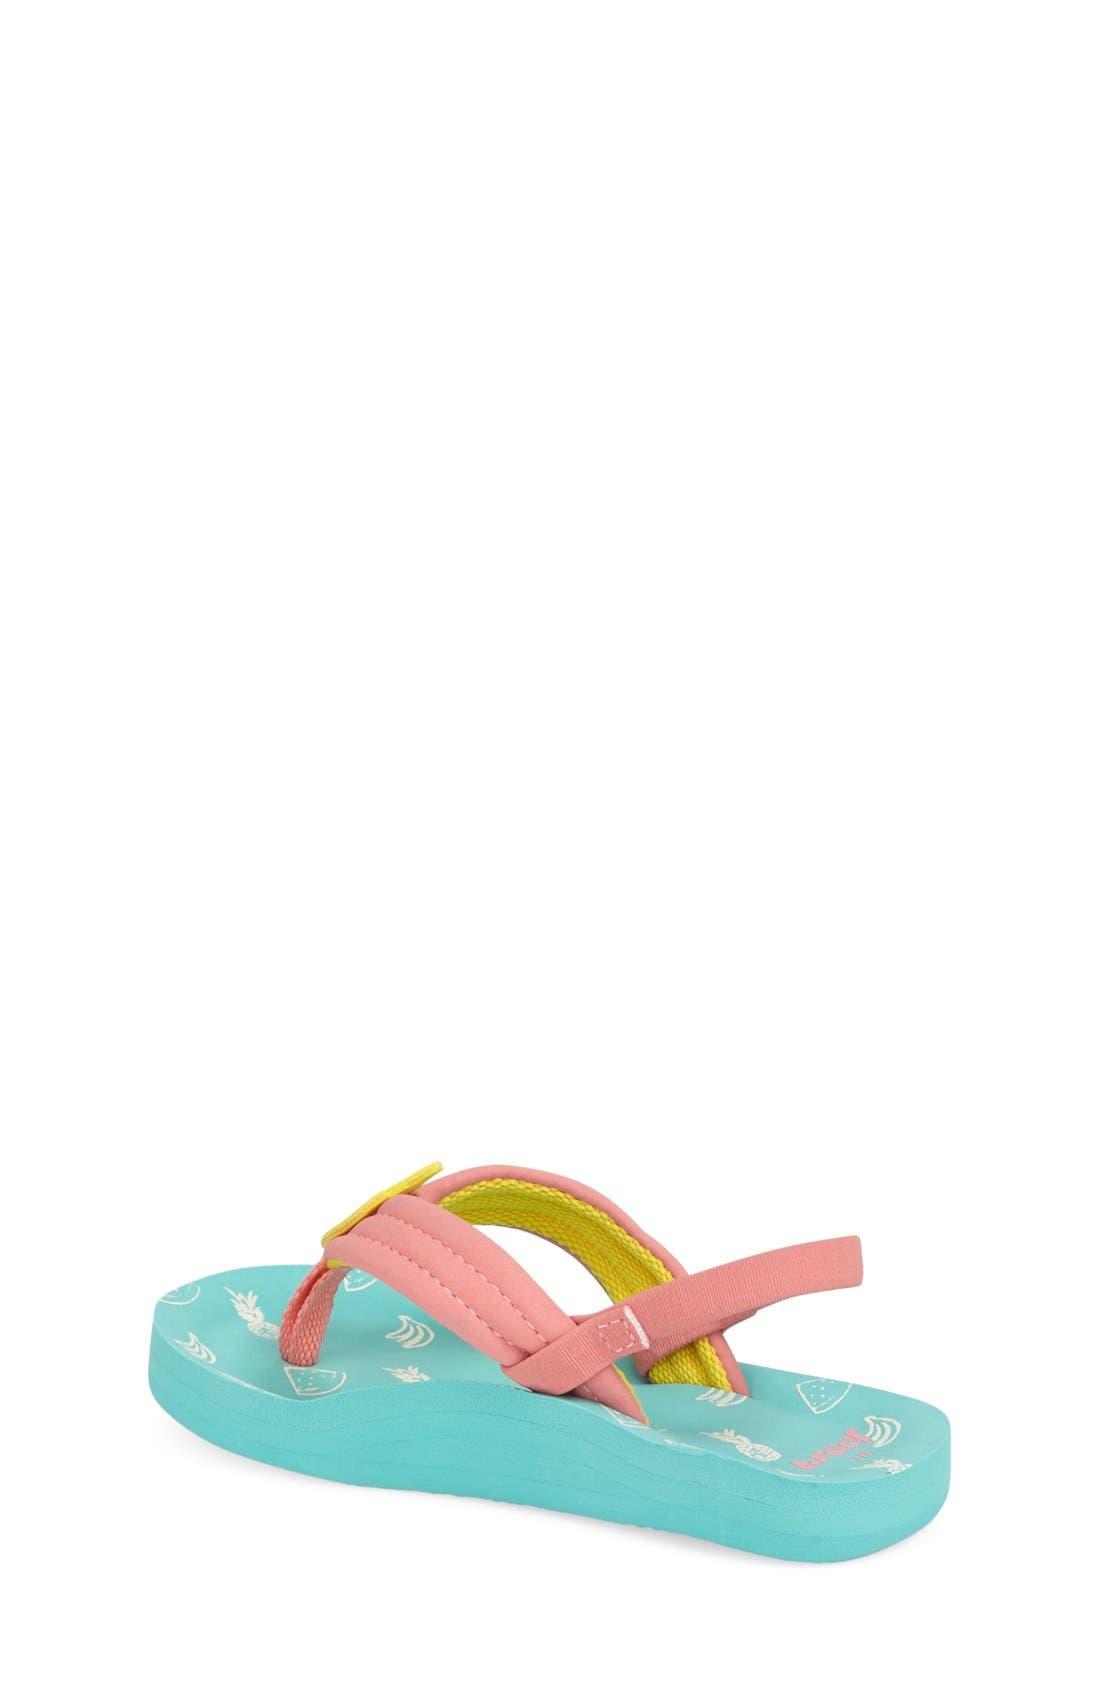 'Little Ahi' Thong Sandal,                             Alternate thumbnail 33, color,